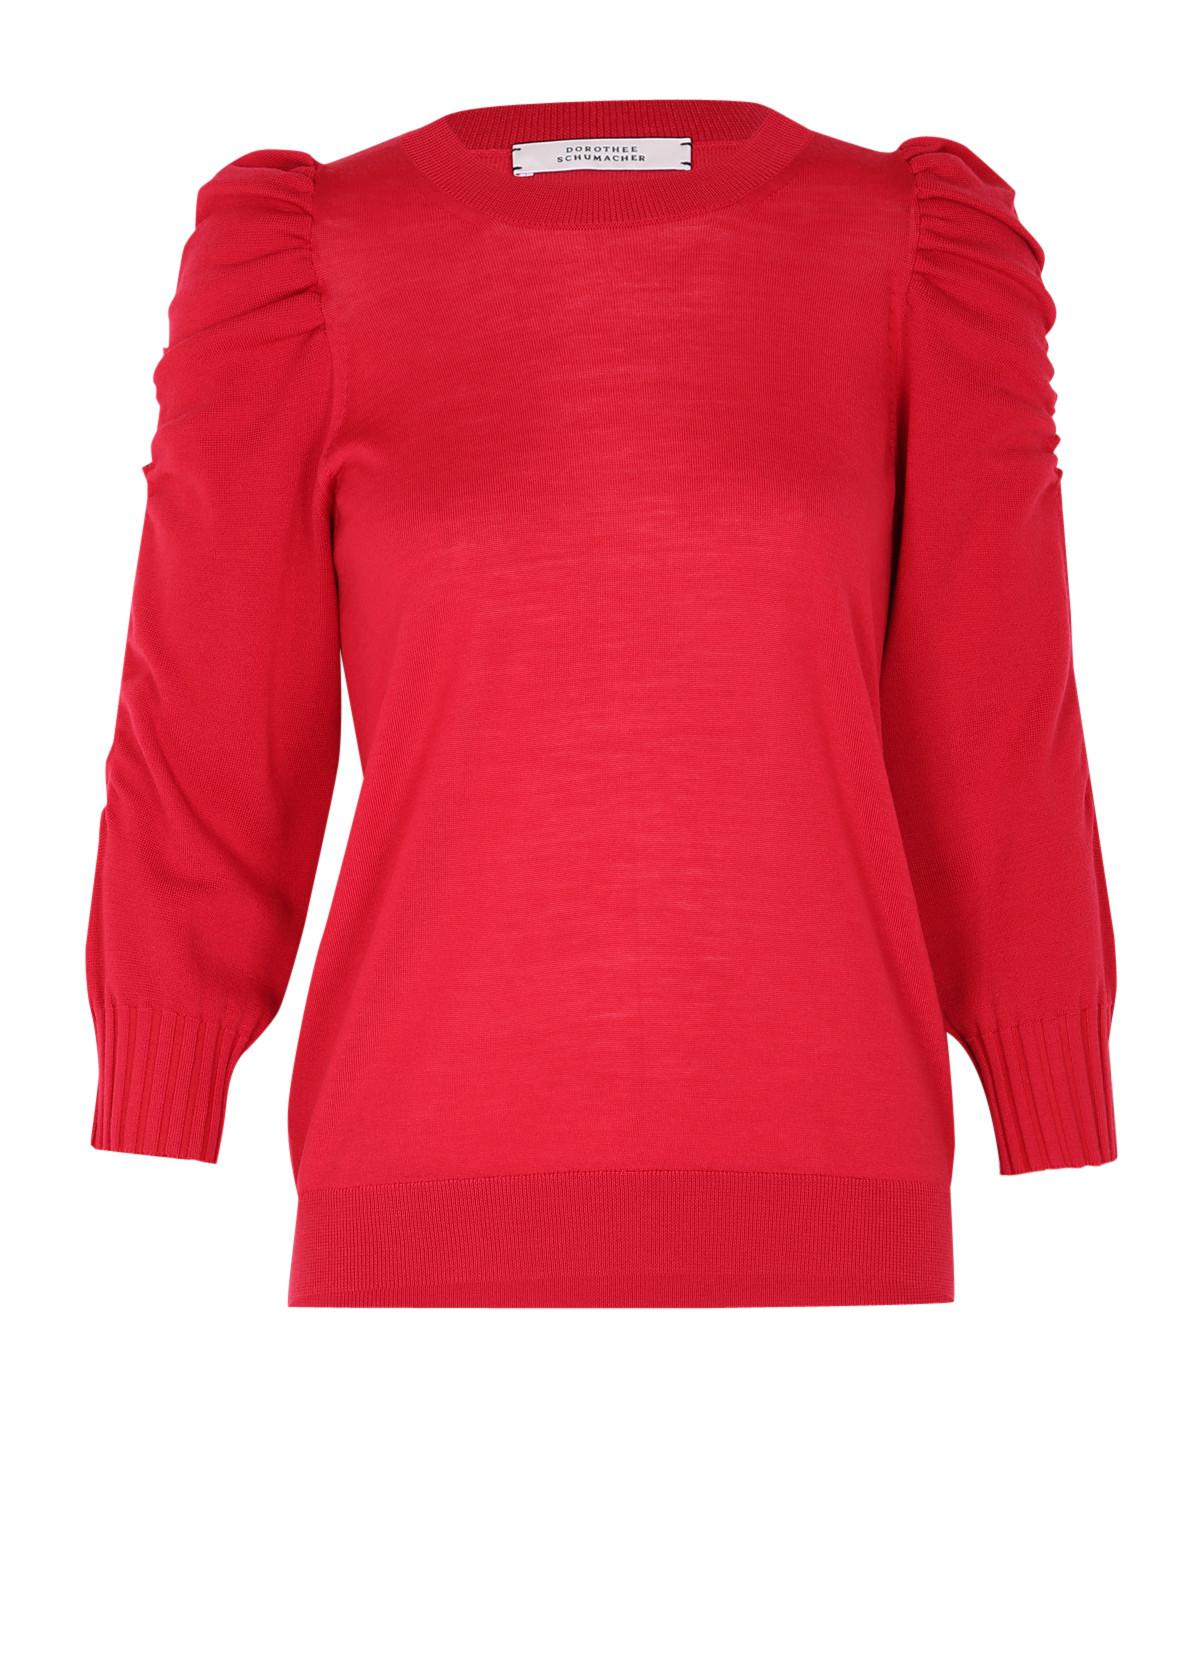 dorothee schumacher tender transit pullover o neck 3 4 in red save 3 lyst. Black Bedroom Furniture Sets. Home Design Ideas